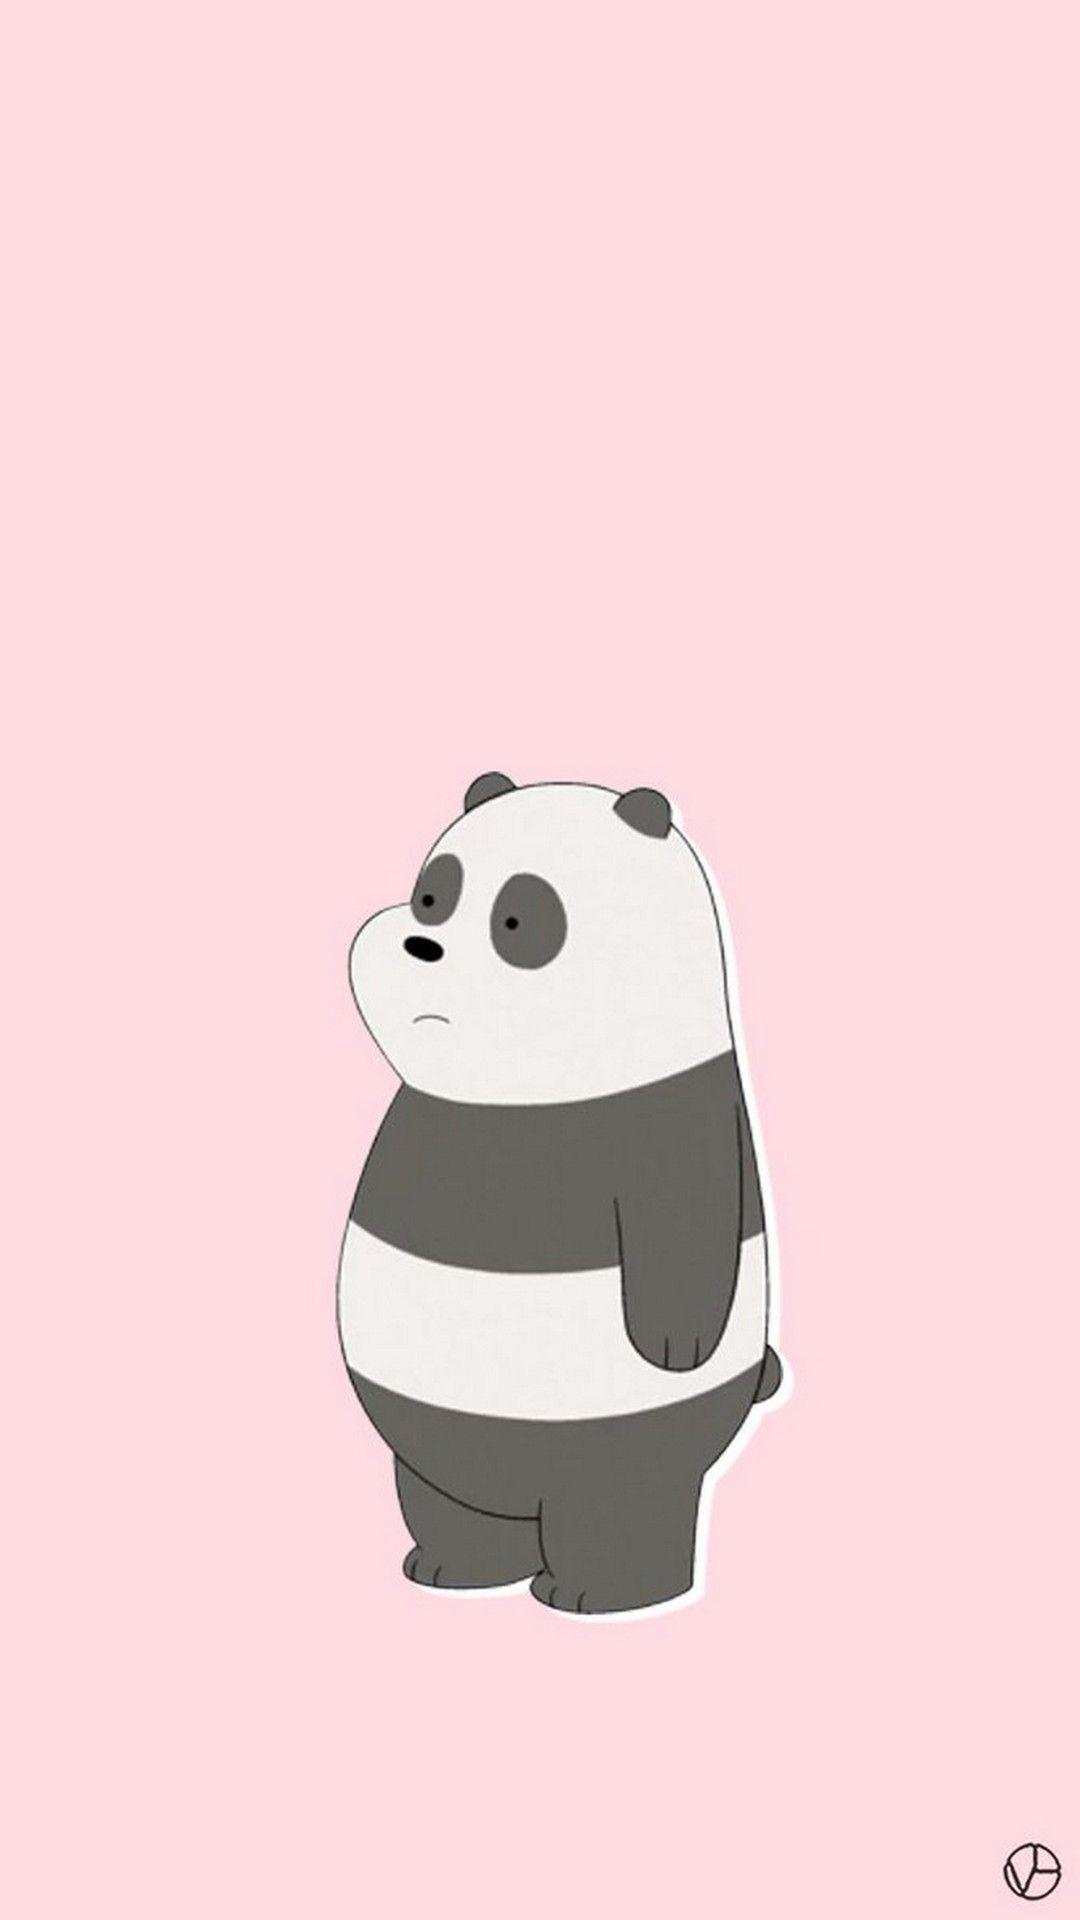 40+ Pink Panda Wallpapers Download at WallpaperBro